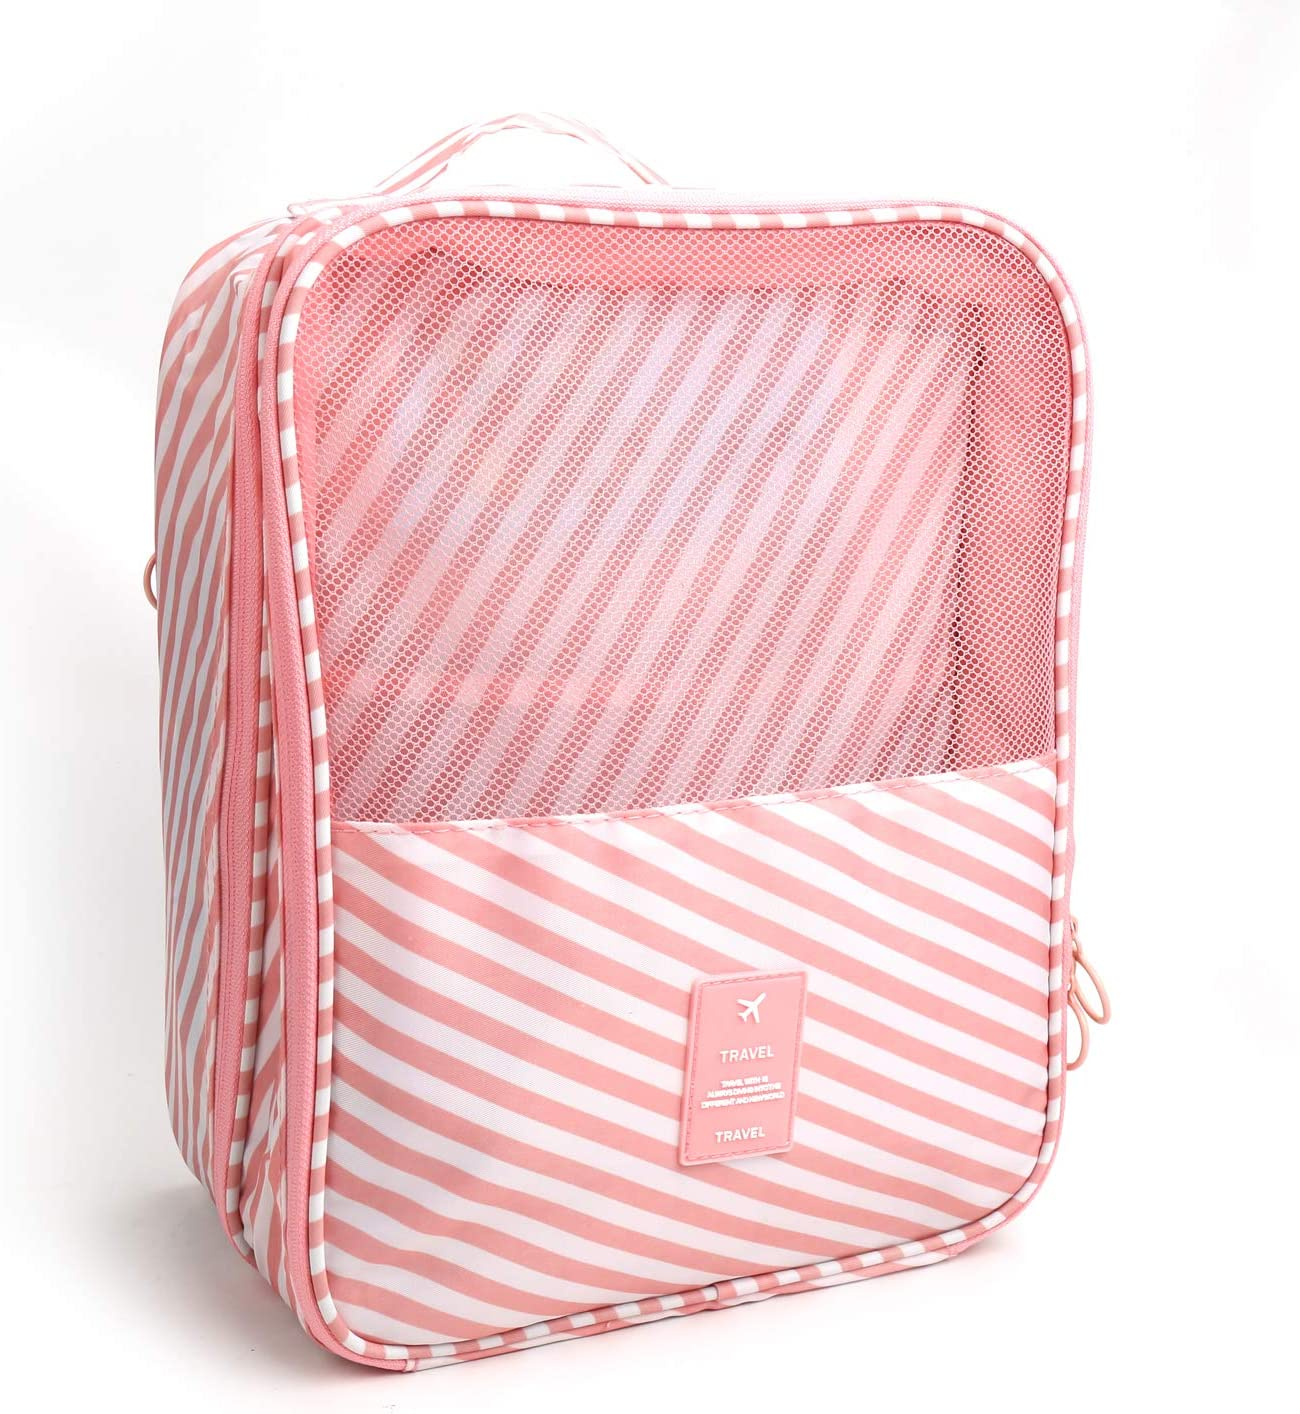 Popular brand in the world AZFUNN Shoe Storage Bag Organizer shipfree for Travel Foldable